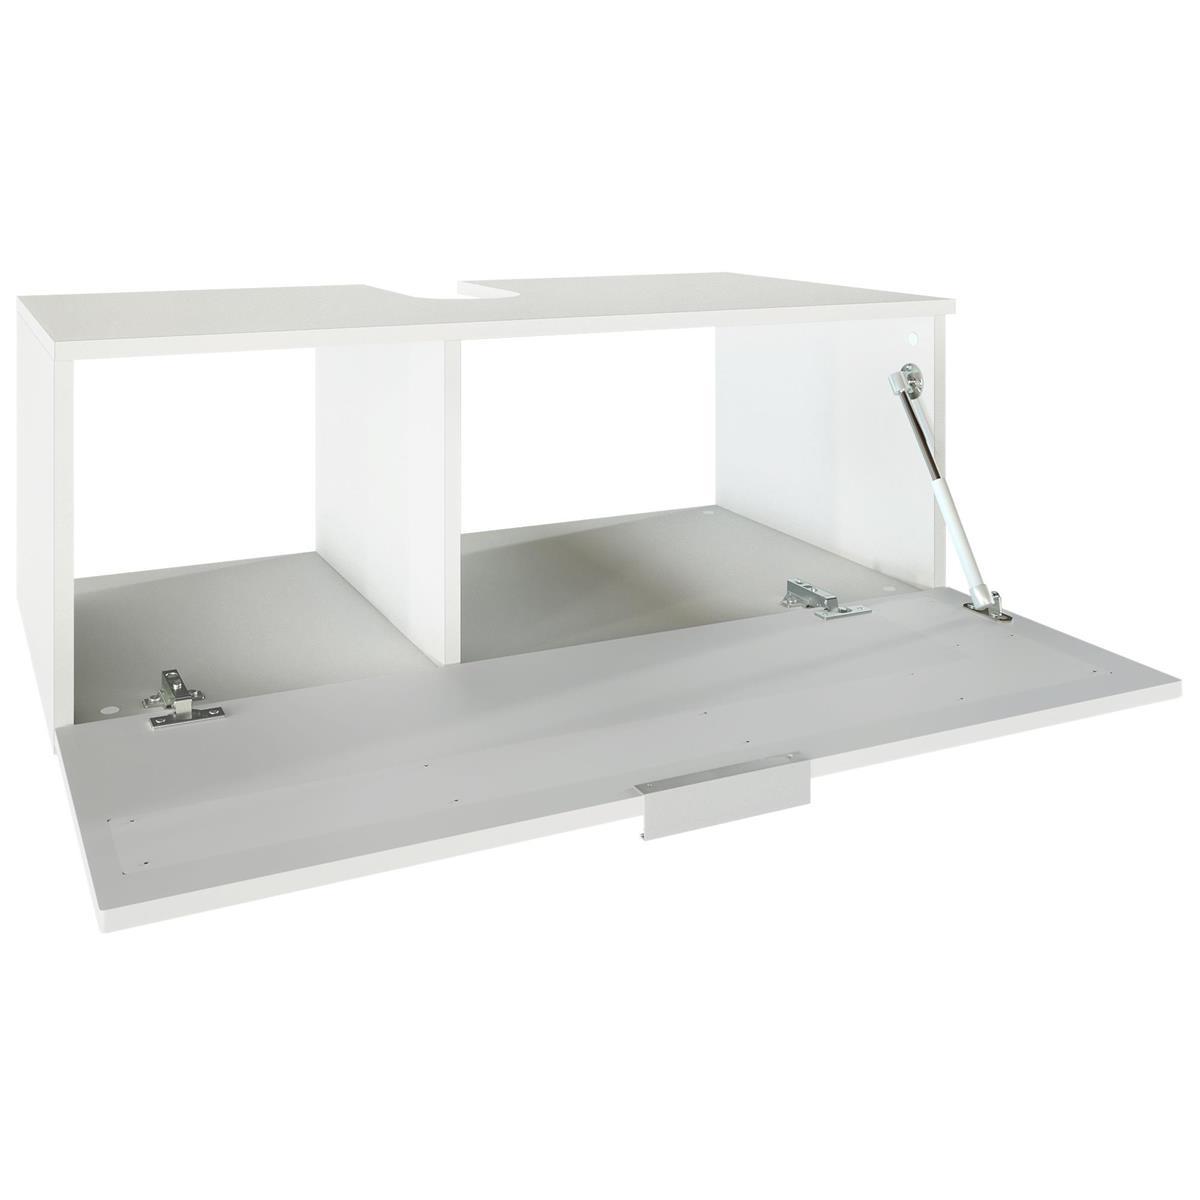 Salle de bain armoire lavabo meuble sous vasque miroir led for Meuble lavabo miroir